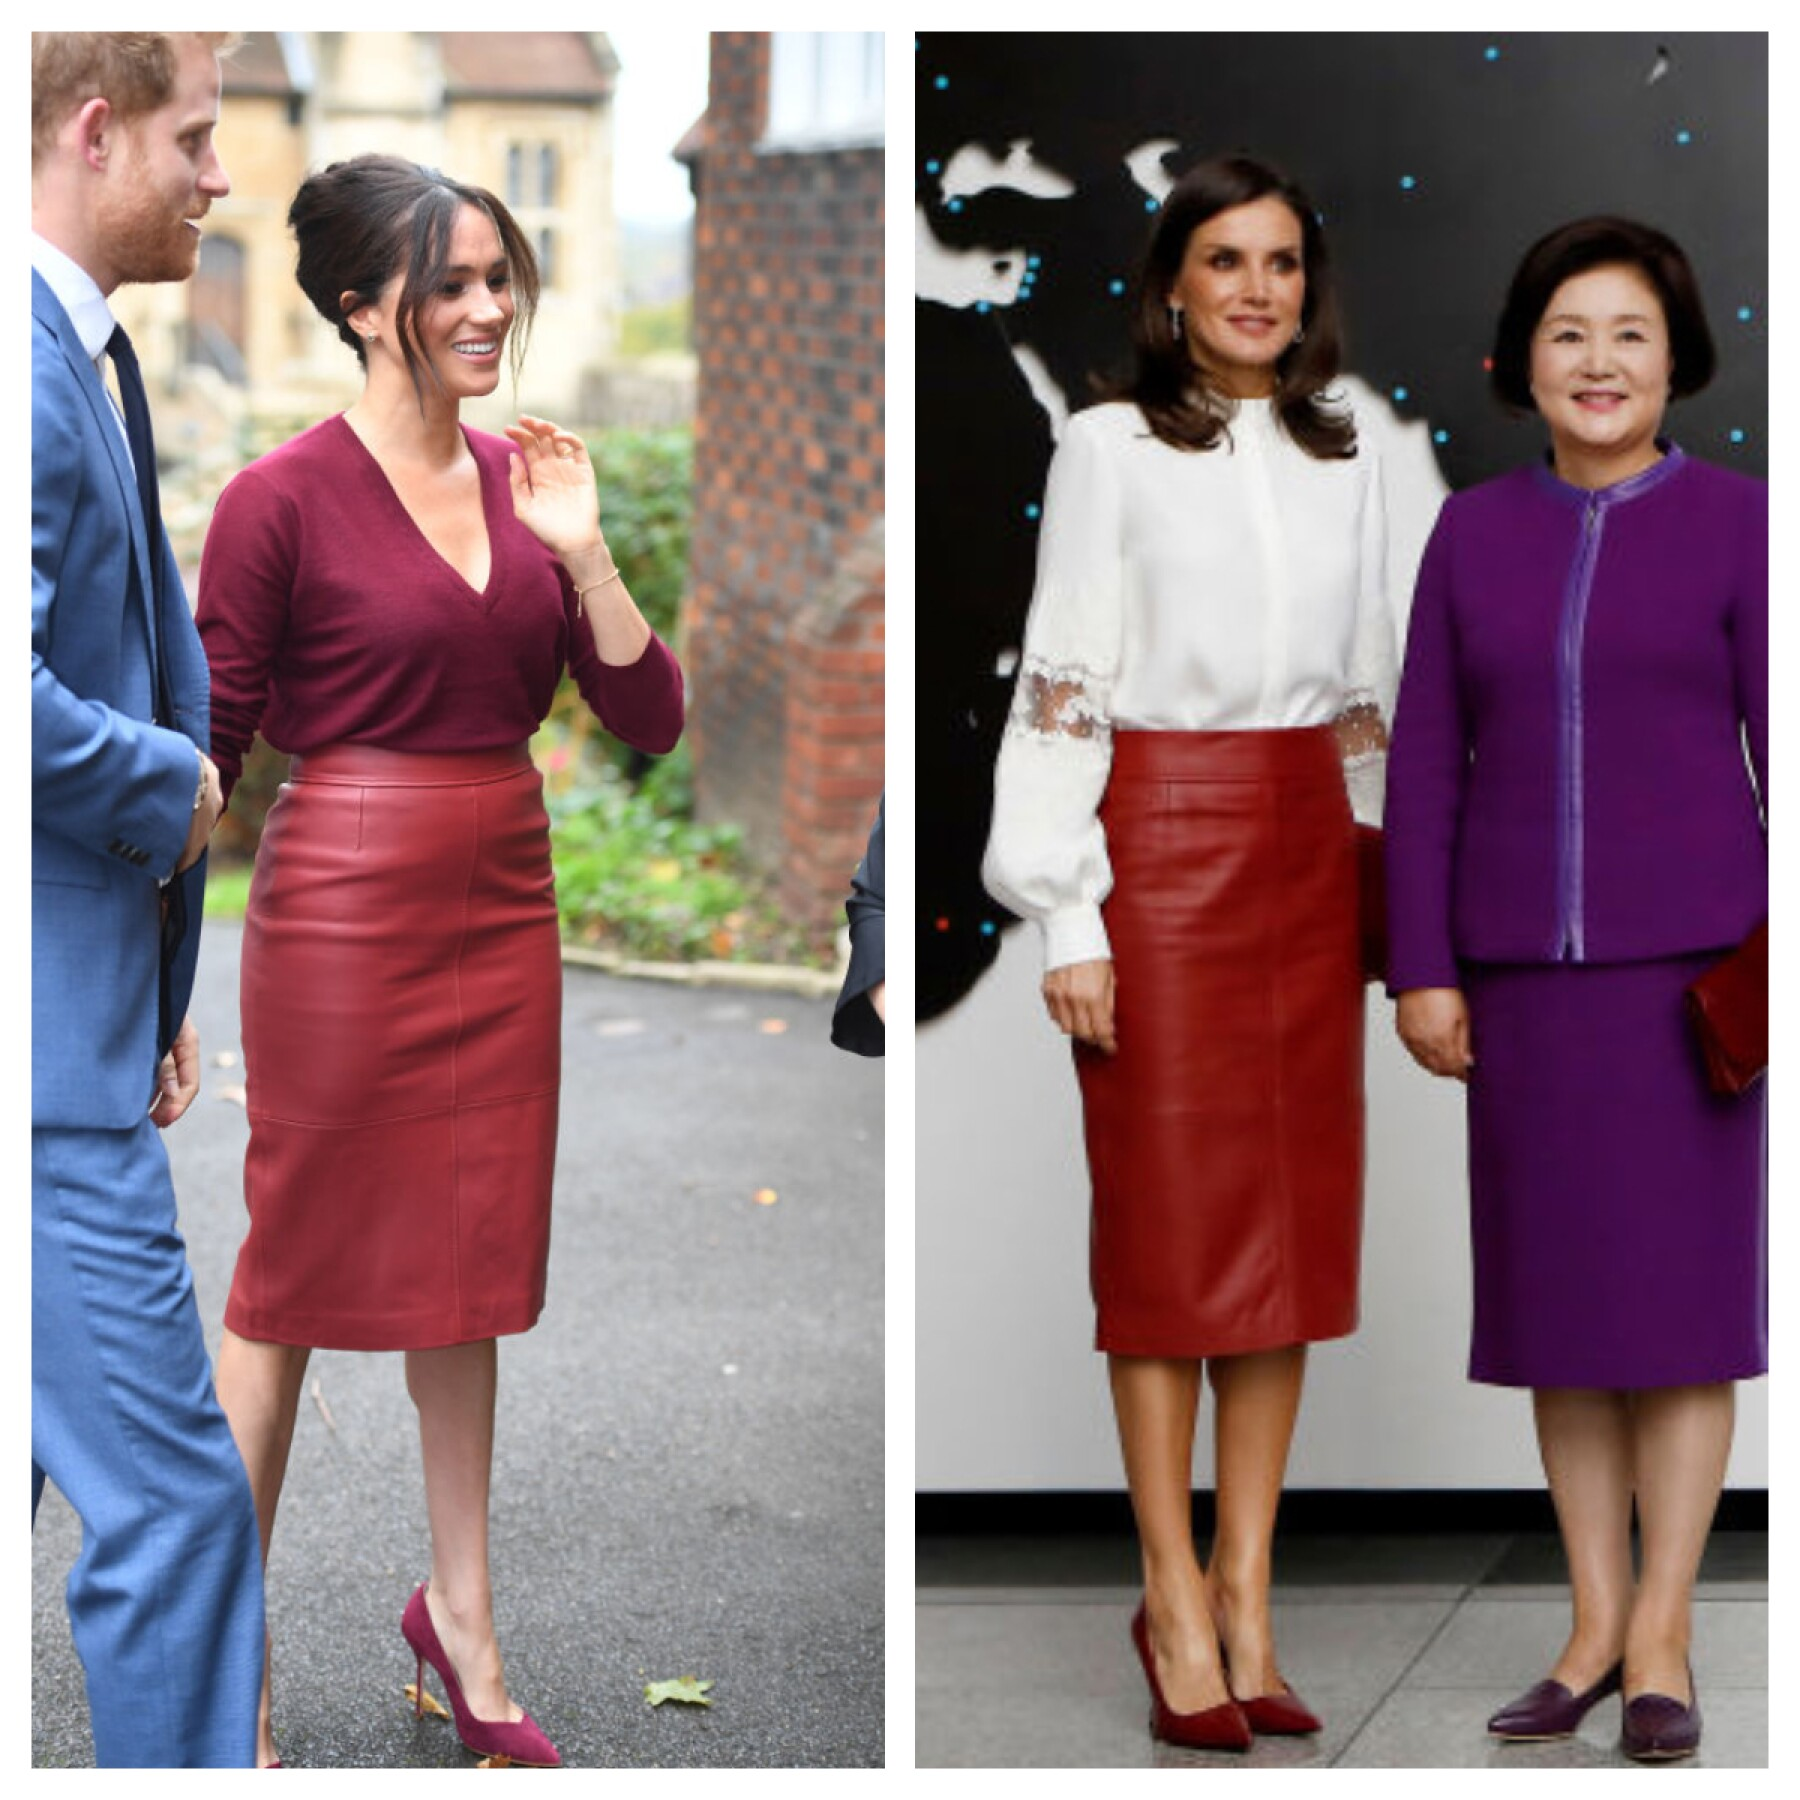 Meghan Markle y la reina Letizia de España